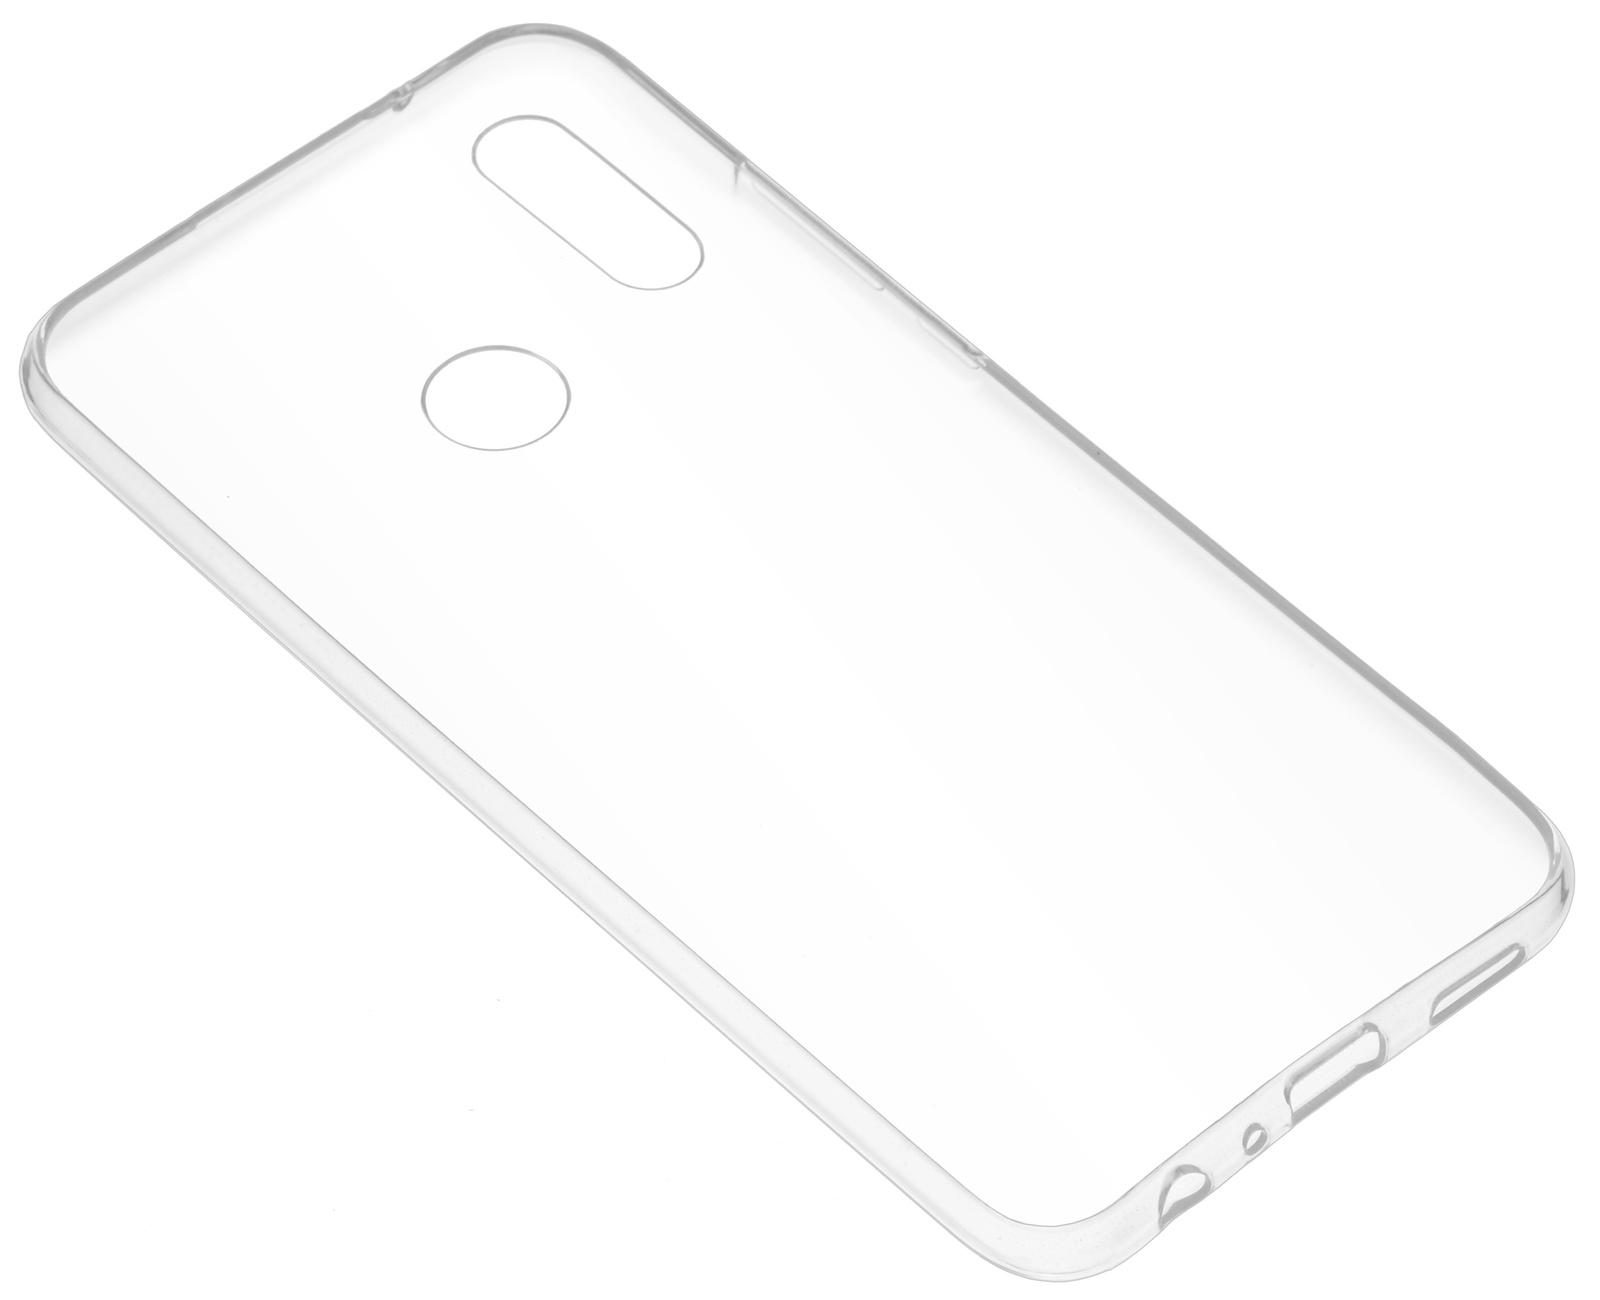 Накладка Skinbox Slim Silicone для Huawei Y9 (2019), 4630042521988, прозрачный цена и фото